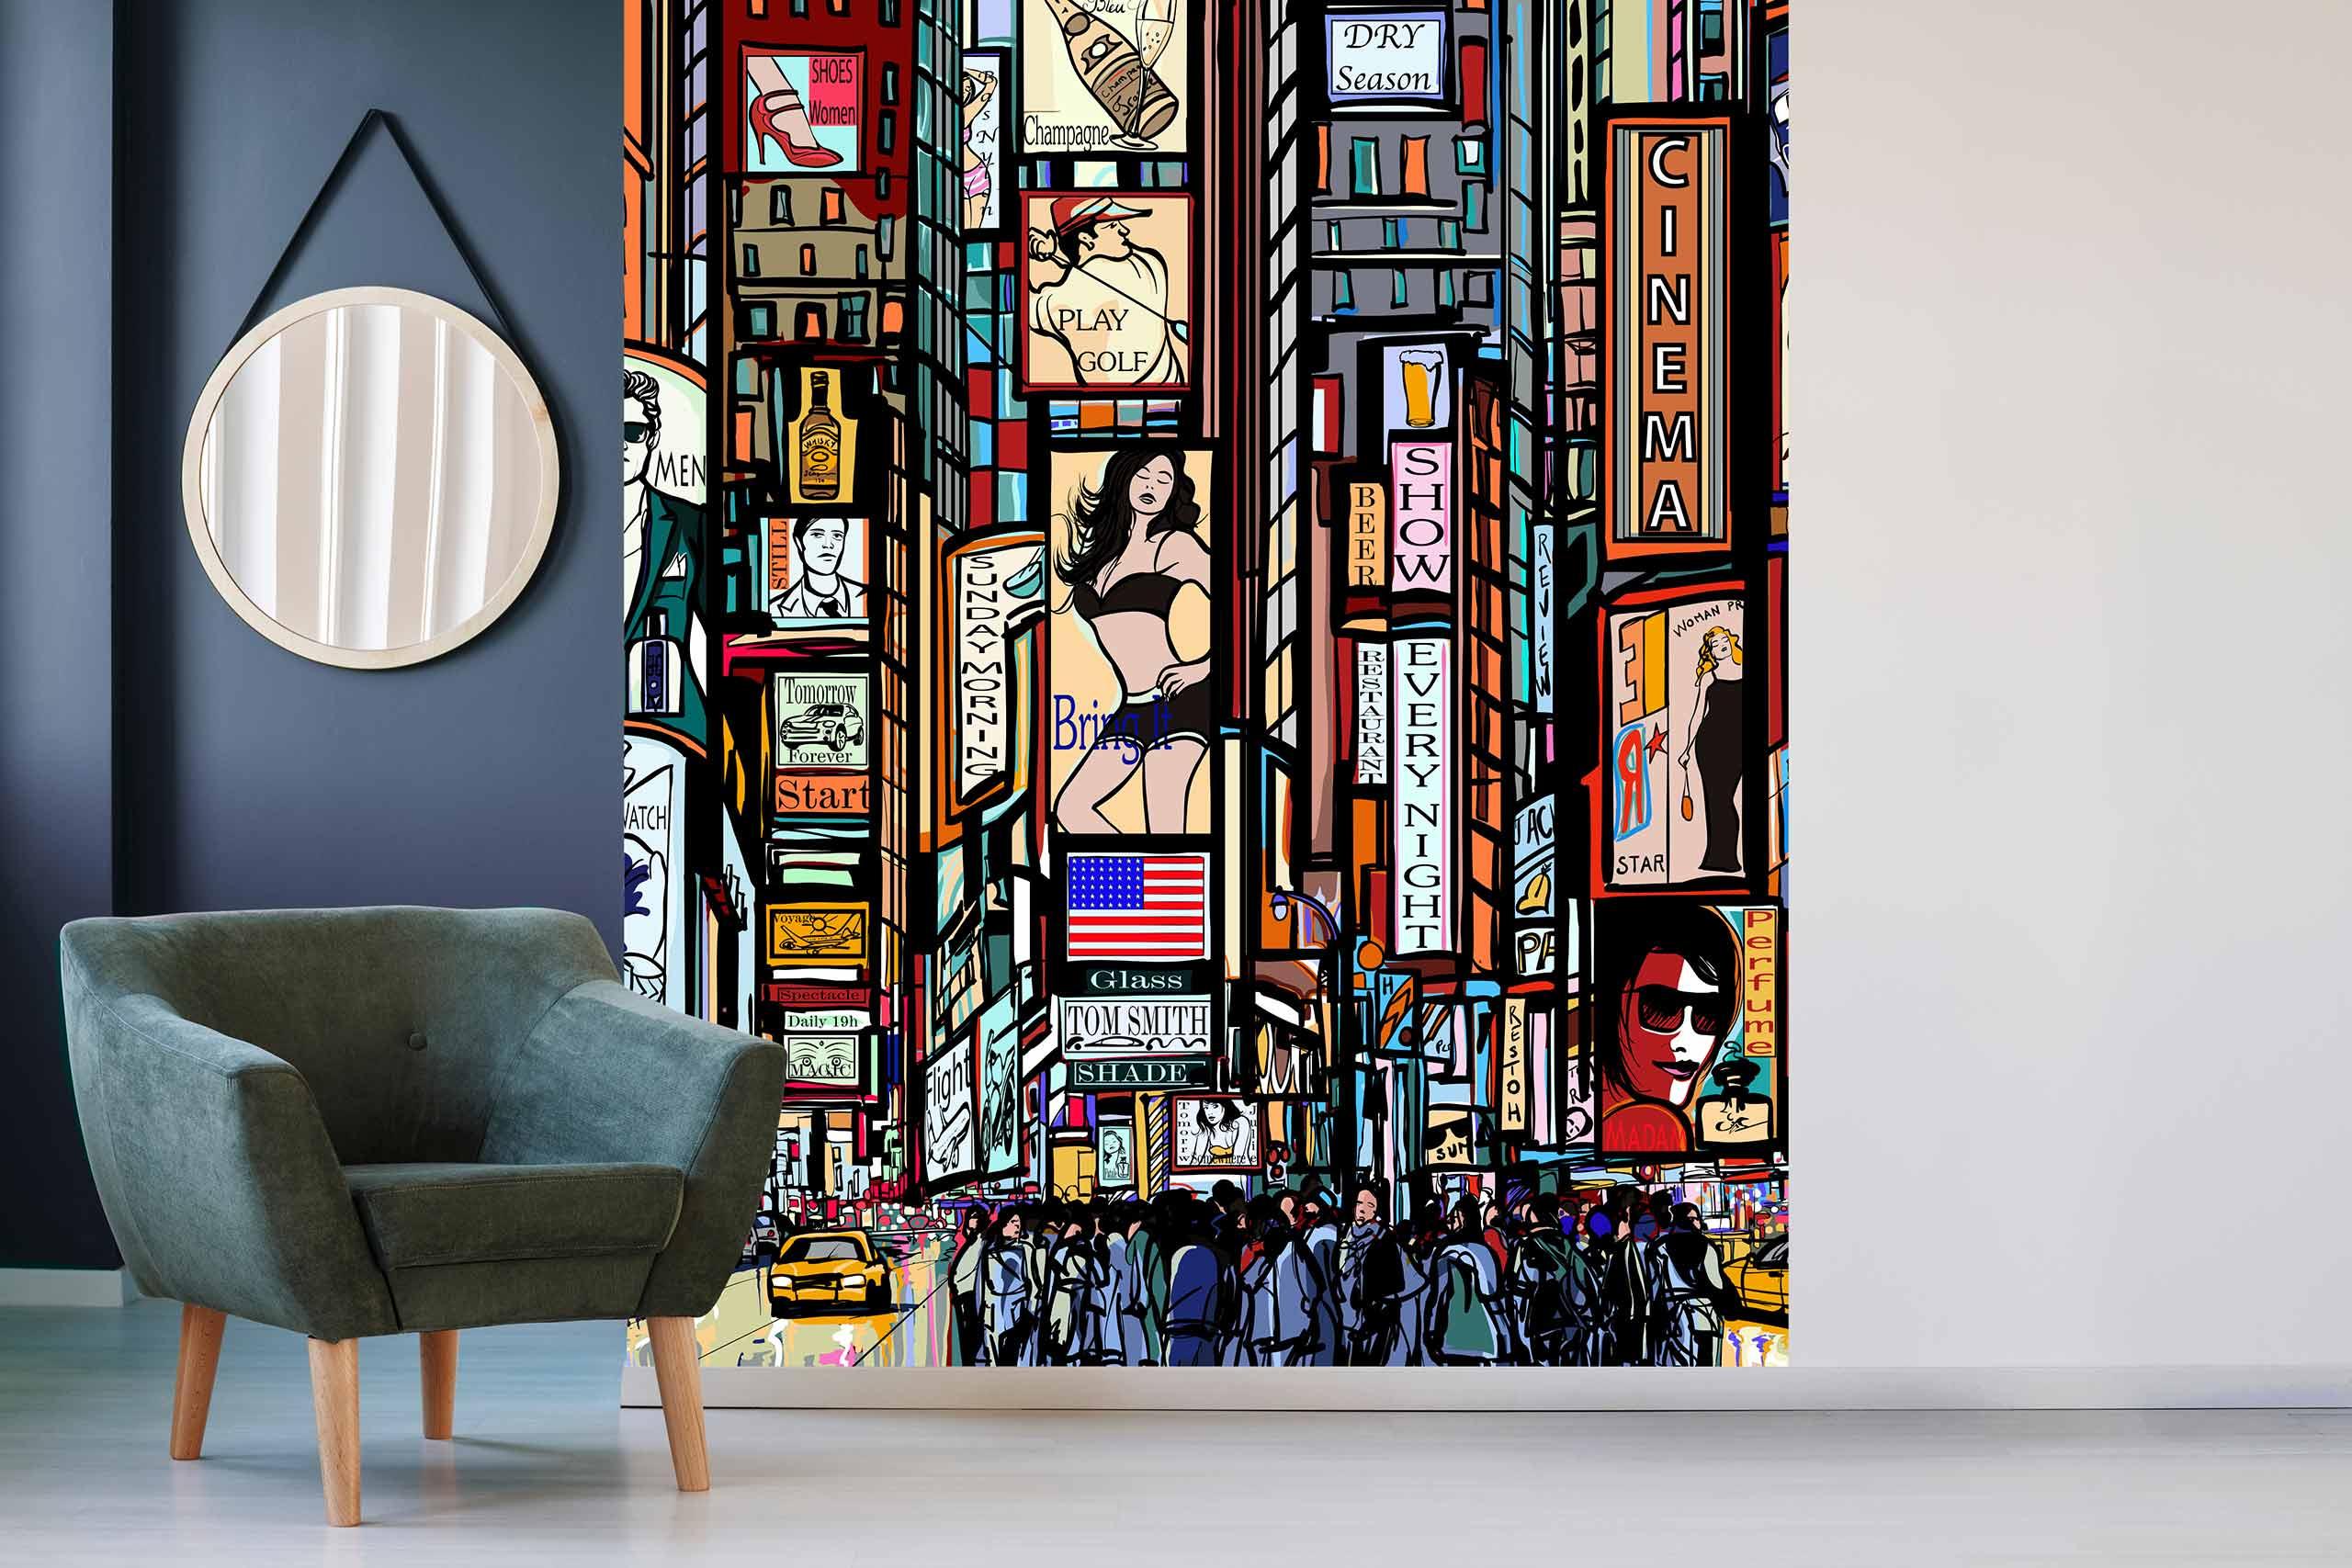 Vlies Tapete 225 Fototapete Höhe 250cm Motiv 13 New York